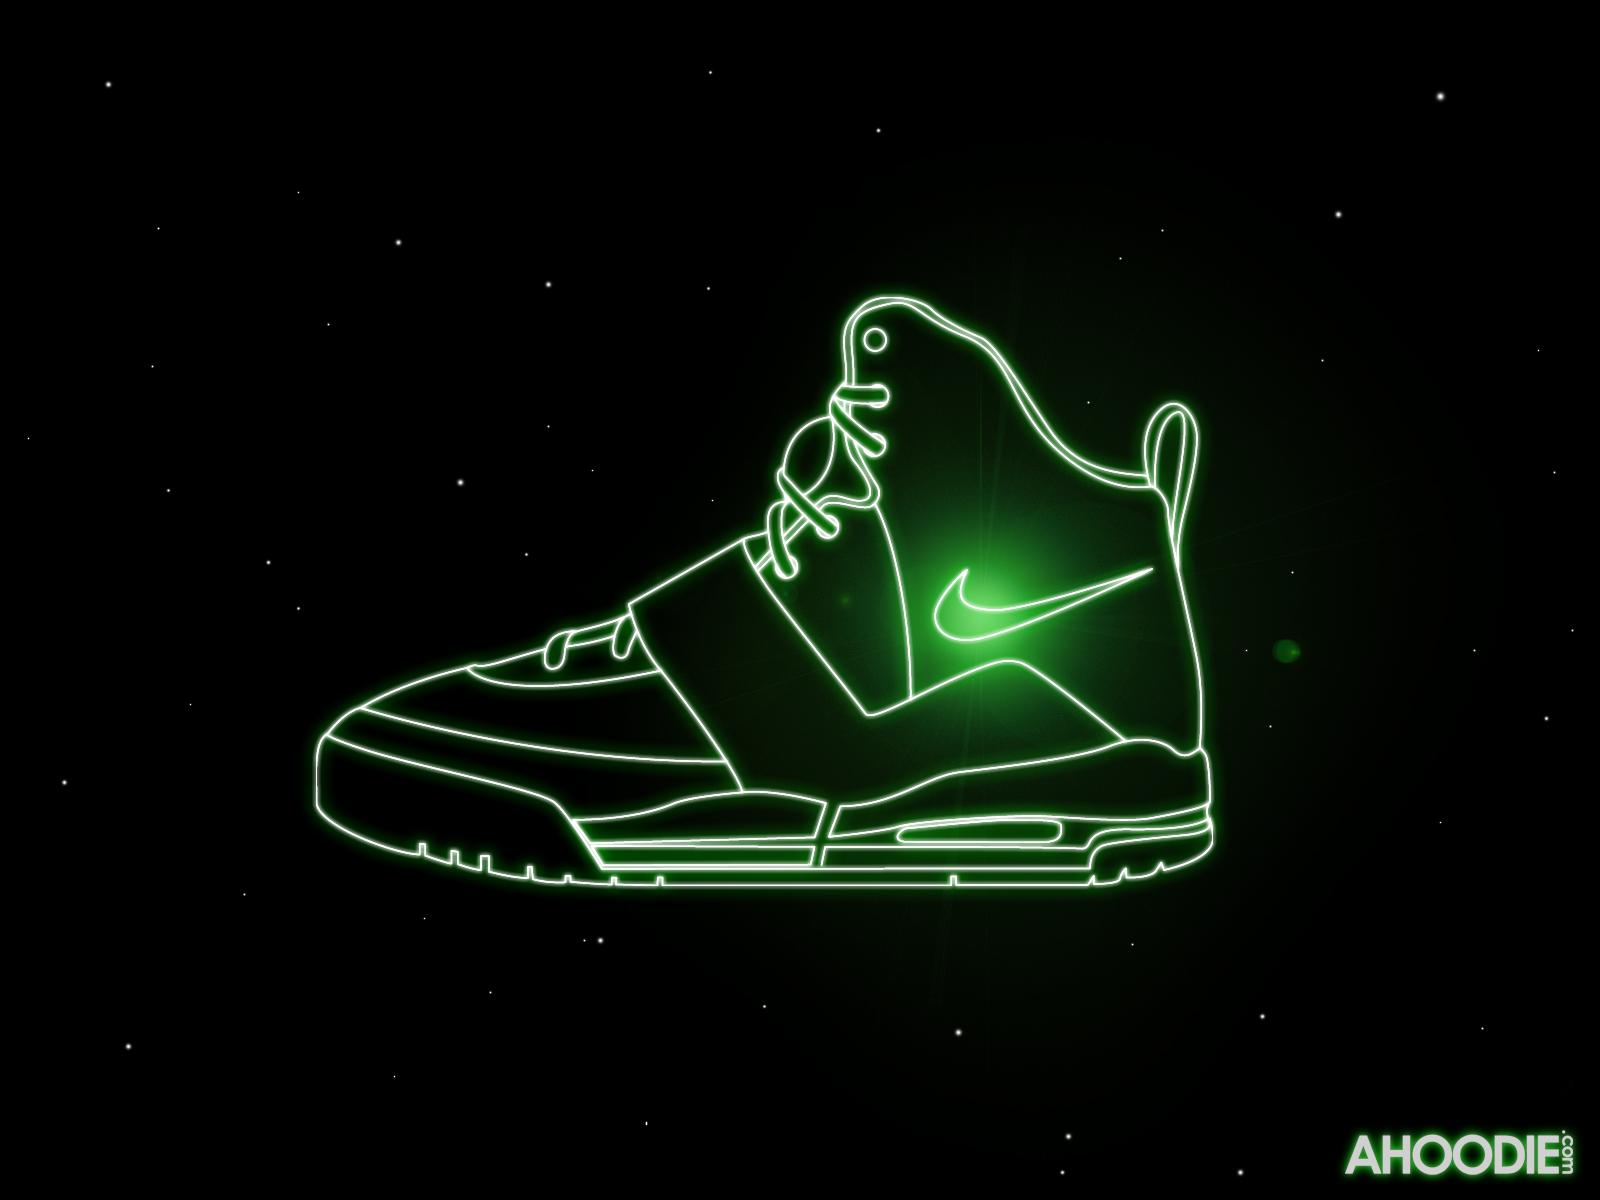 Hd wallpaper nike - Hd Wallpapers Nike Glowing Shoes Logo Hd Wallpaper Hd Wallpaper